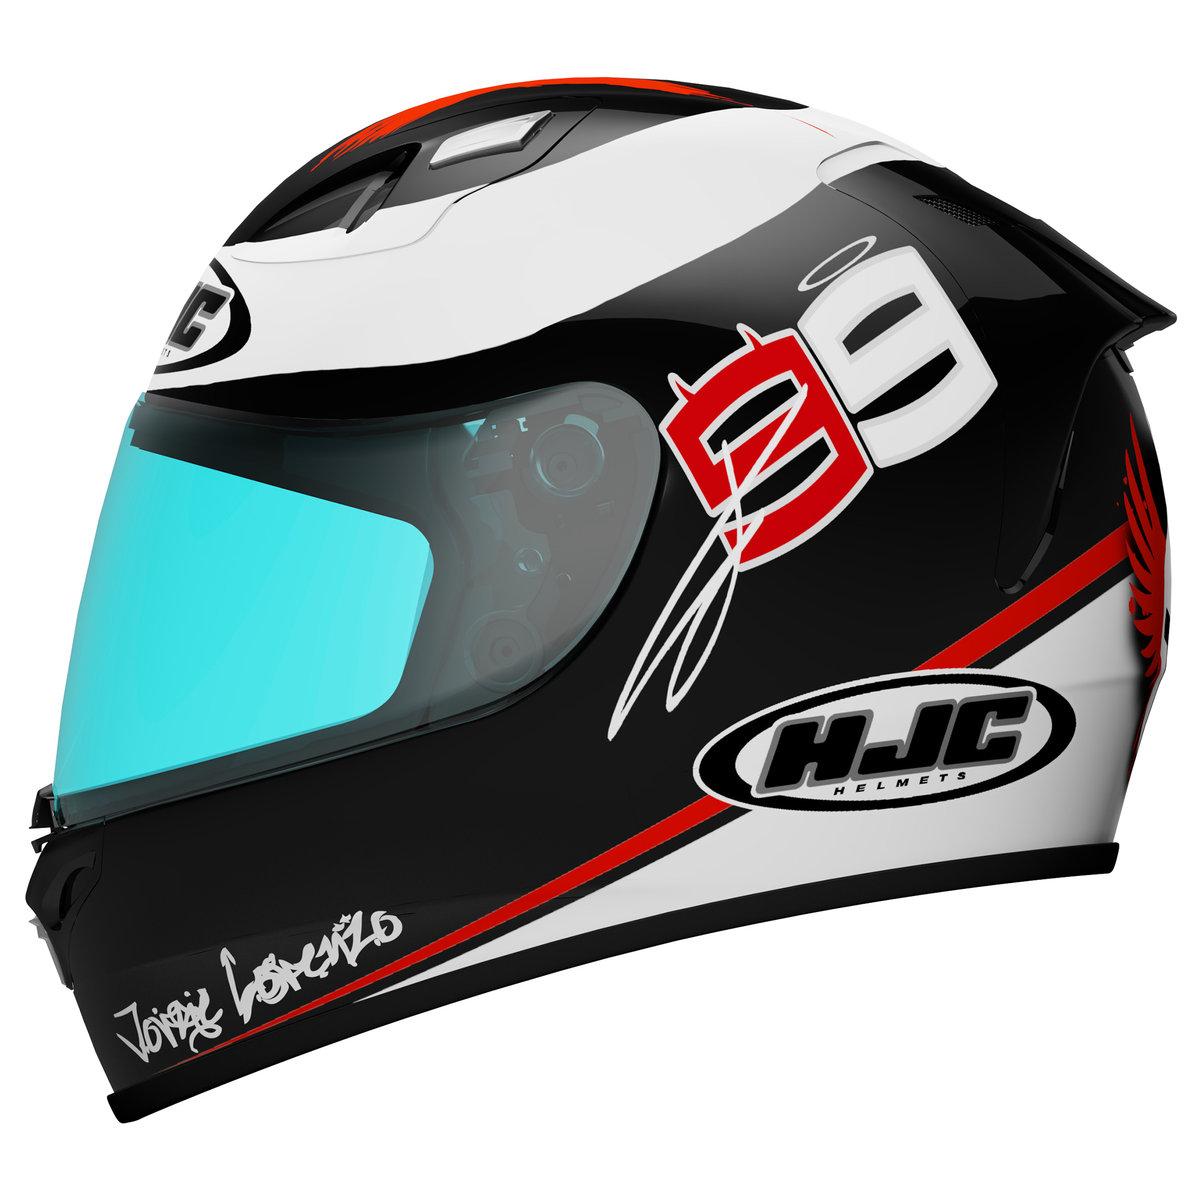 Safest Motorcycle Helmet >> HJC Announces RPS-10 Ben Spies Helmet Replica - autoevolution